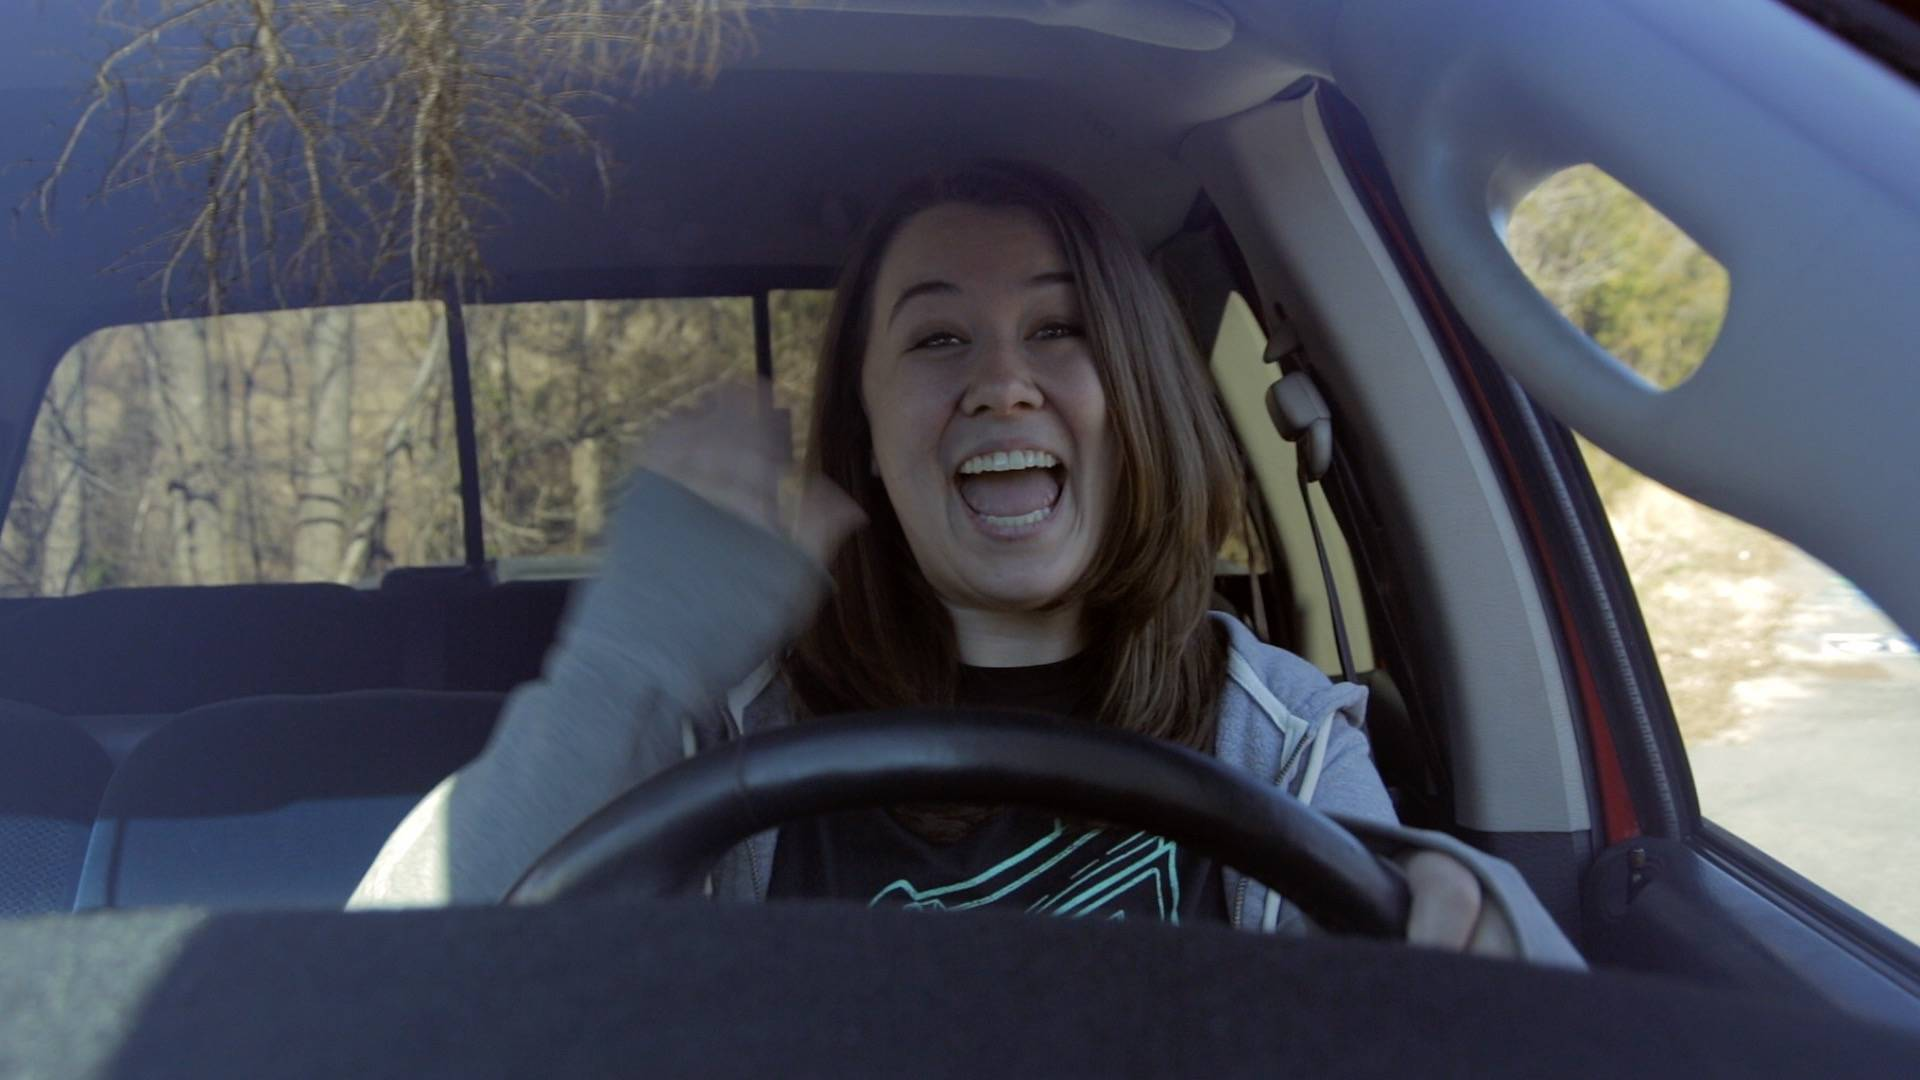 Hood-mounted shot of actor through windshield.